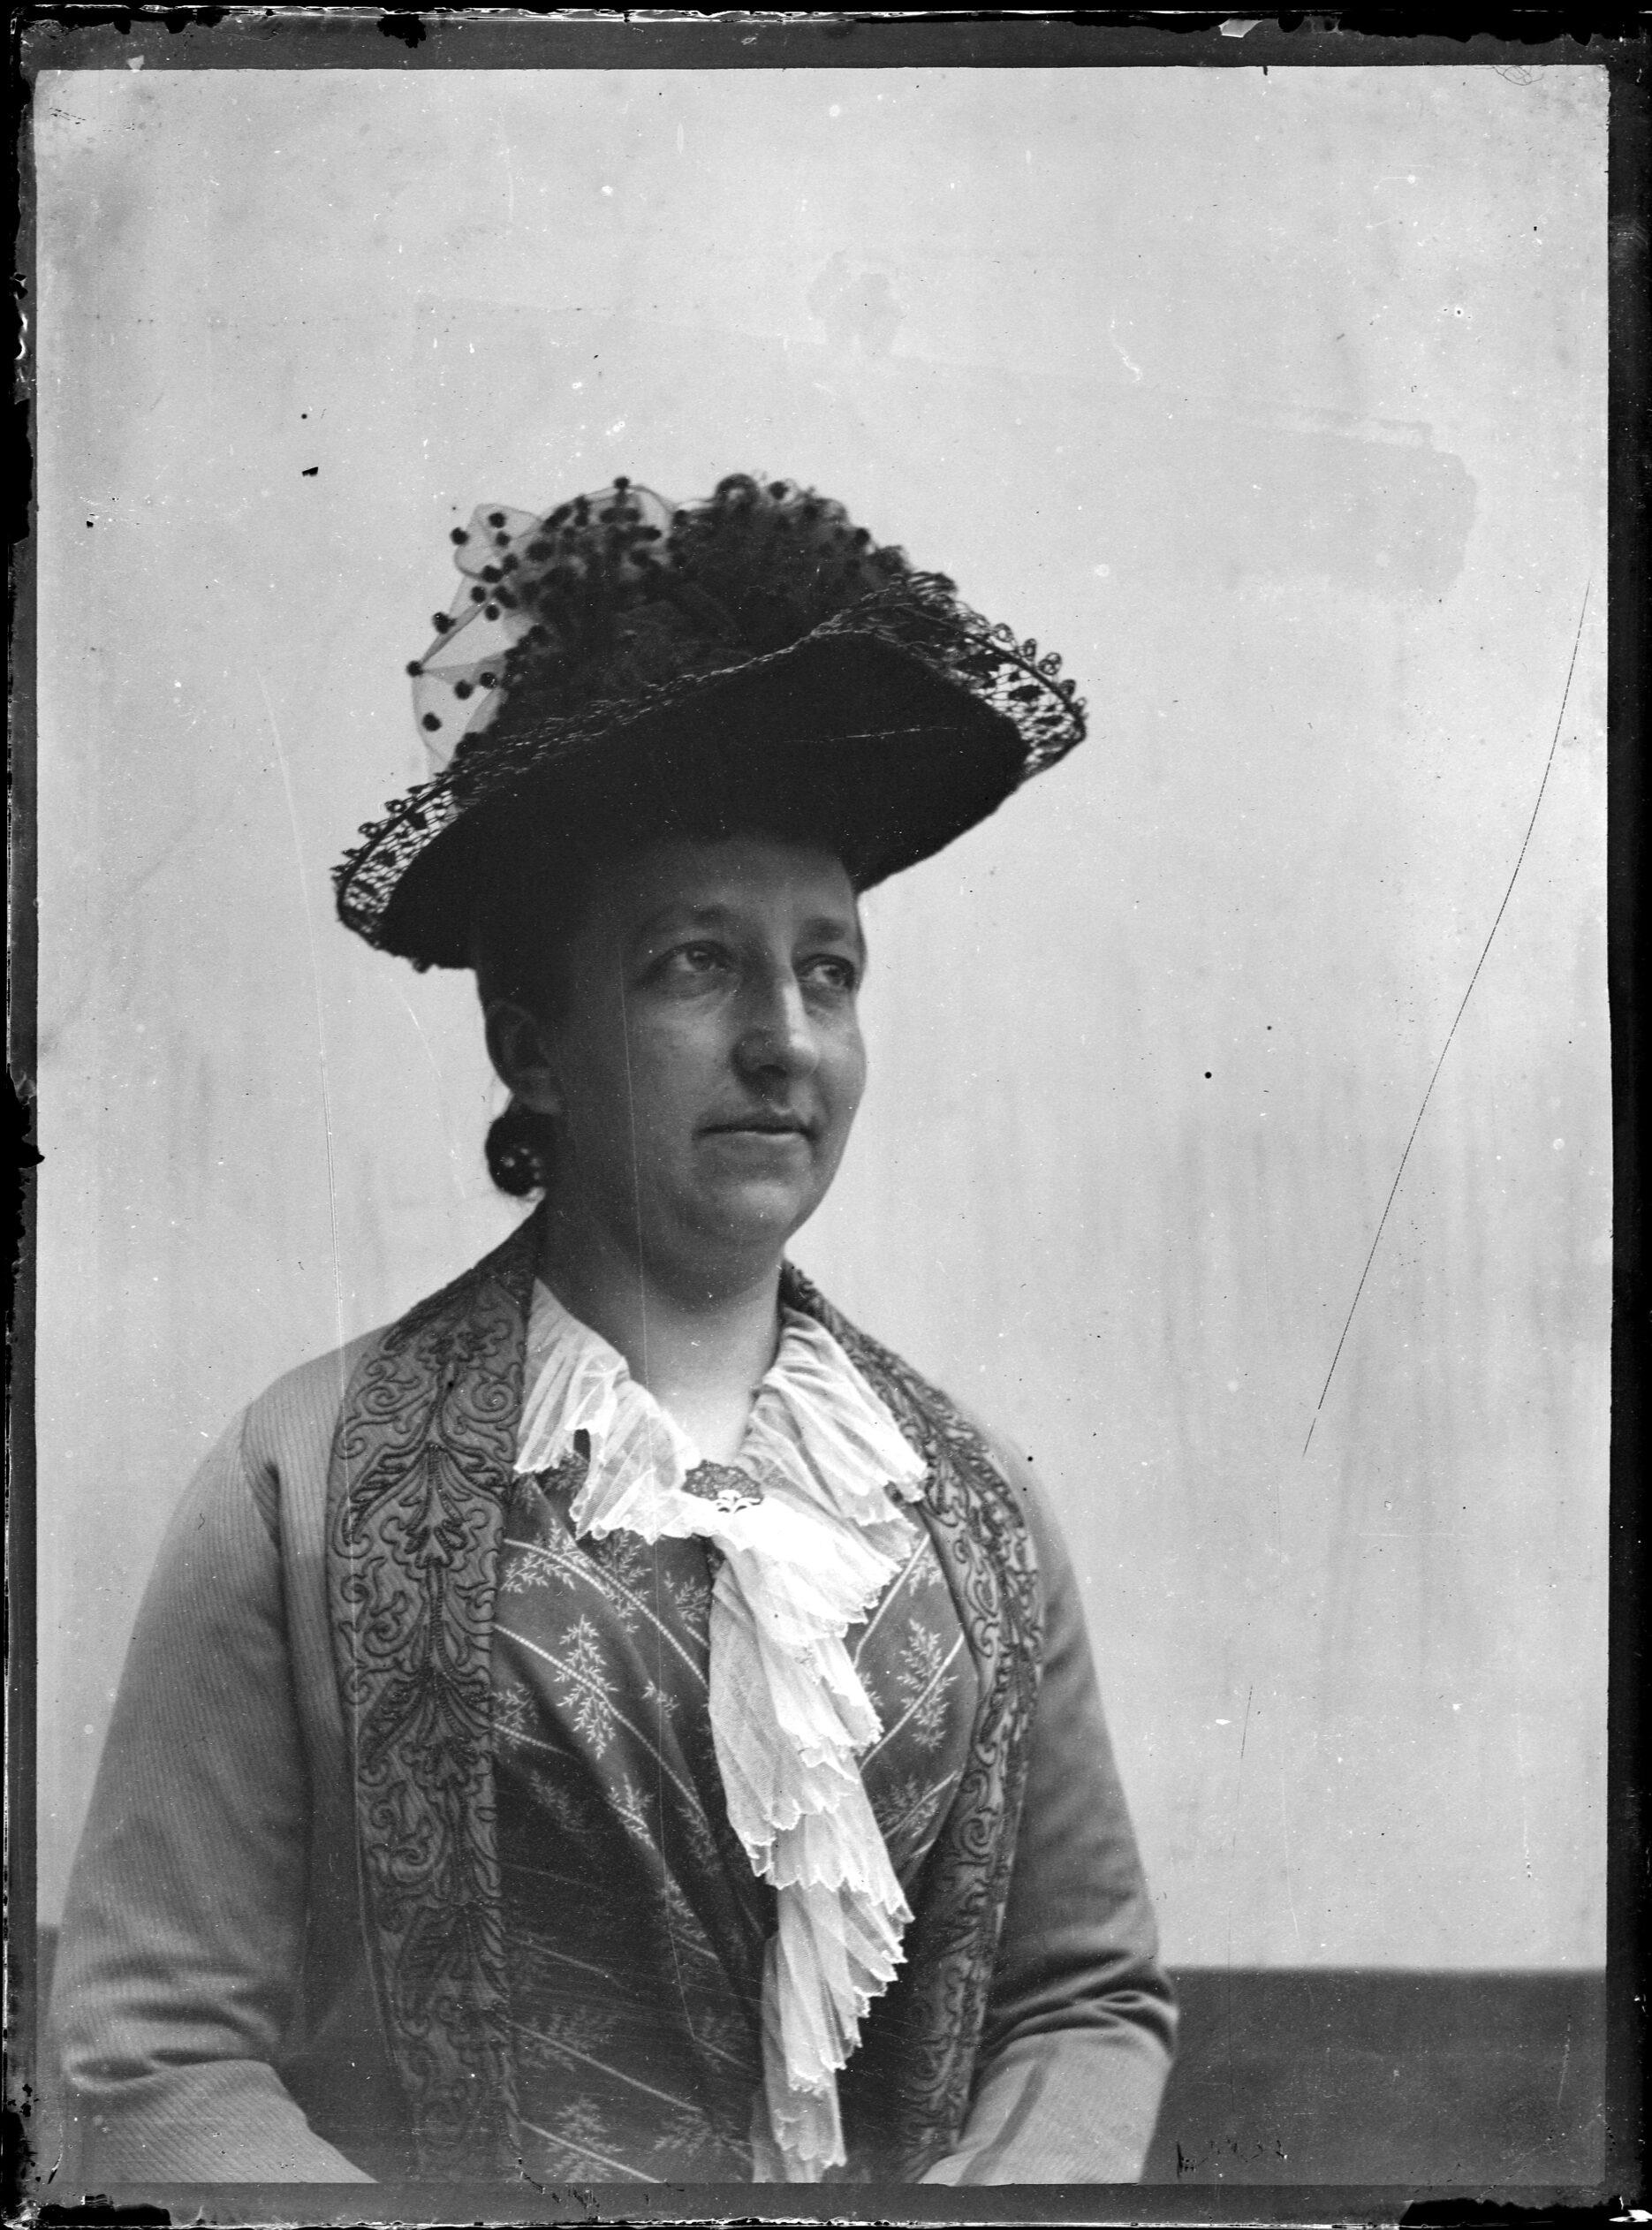 100 Years of feminism in Belgium